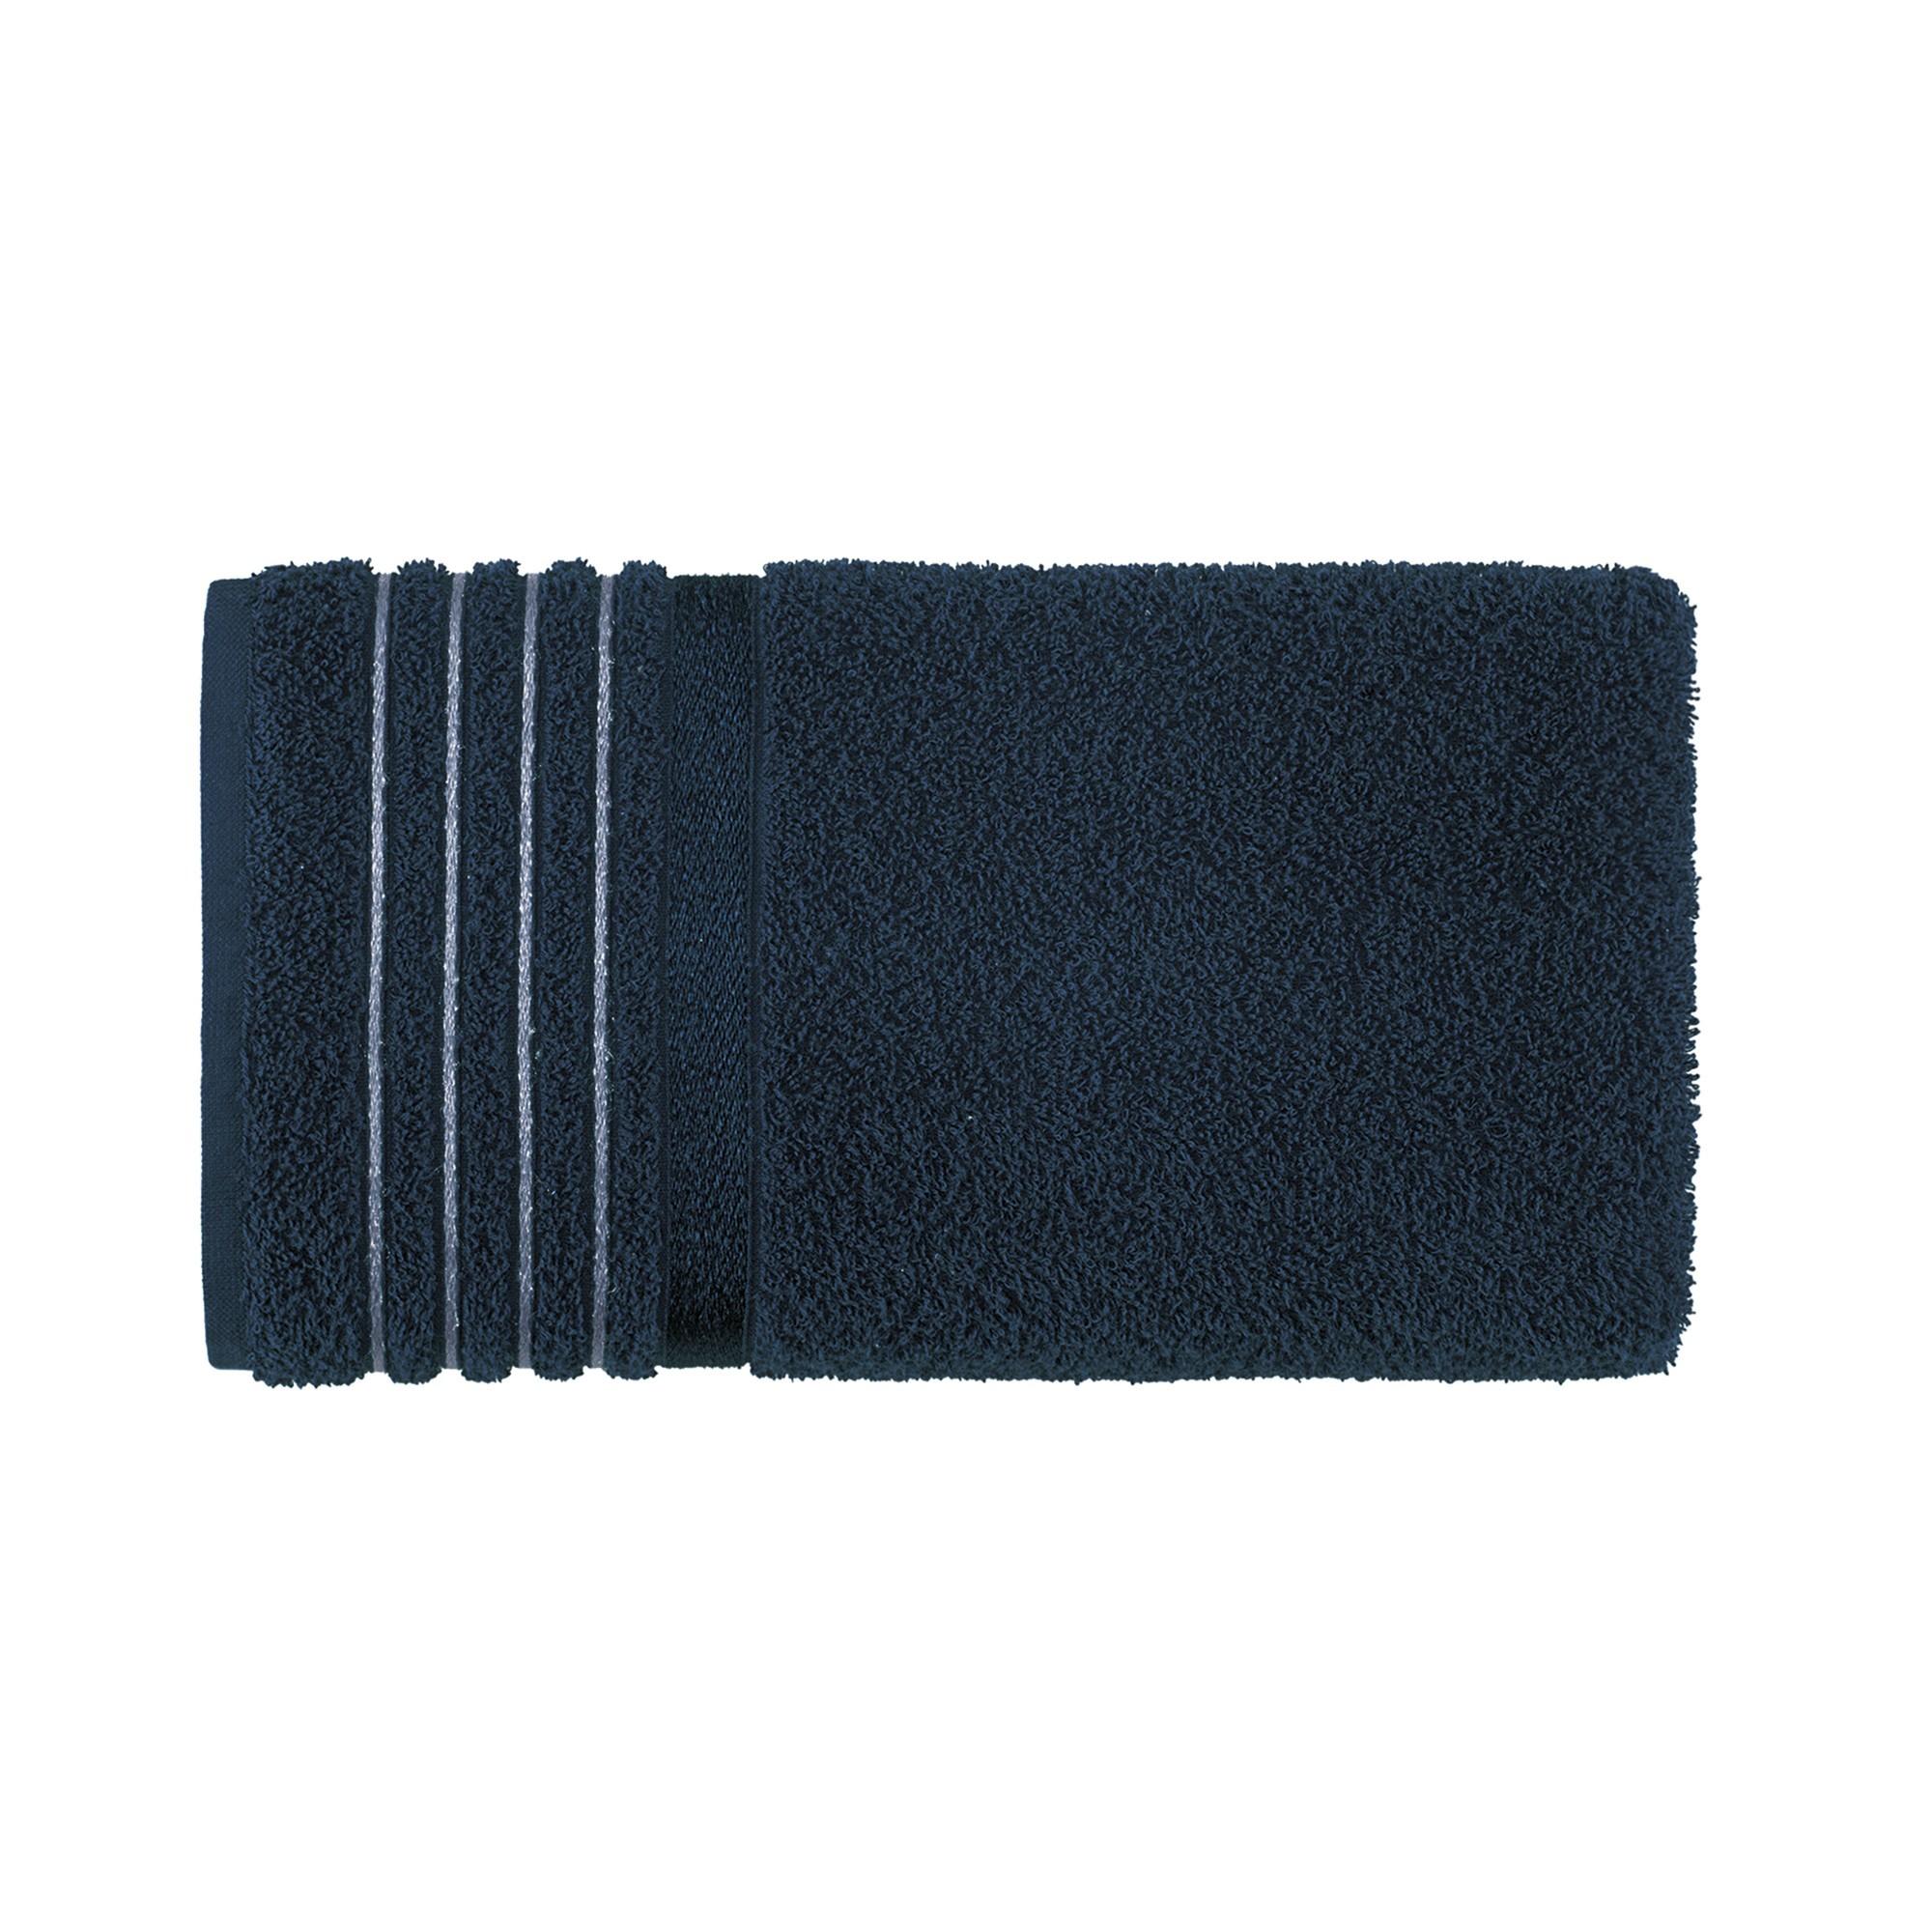 Toalha de Banho Otto Azul 67x135 cm - Karsten